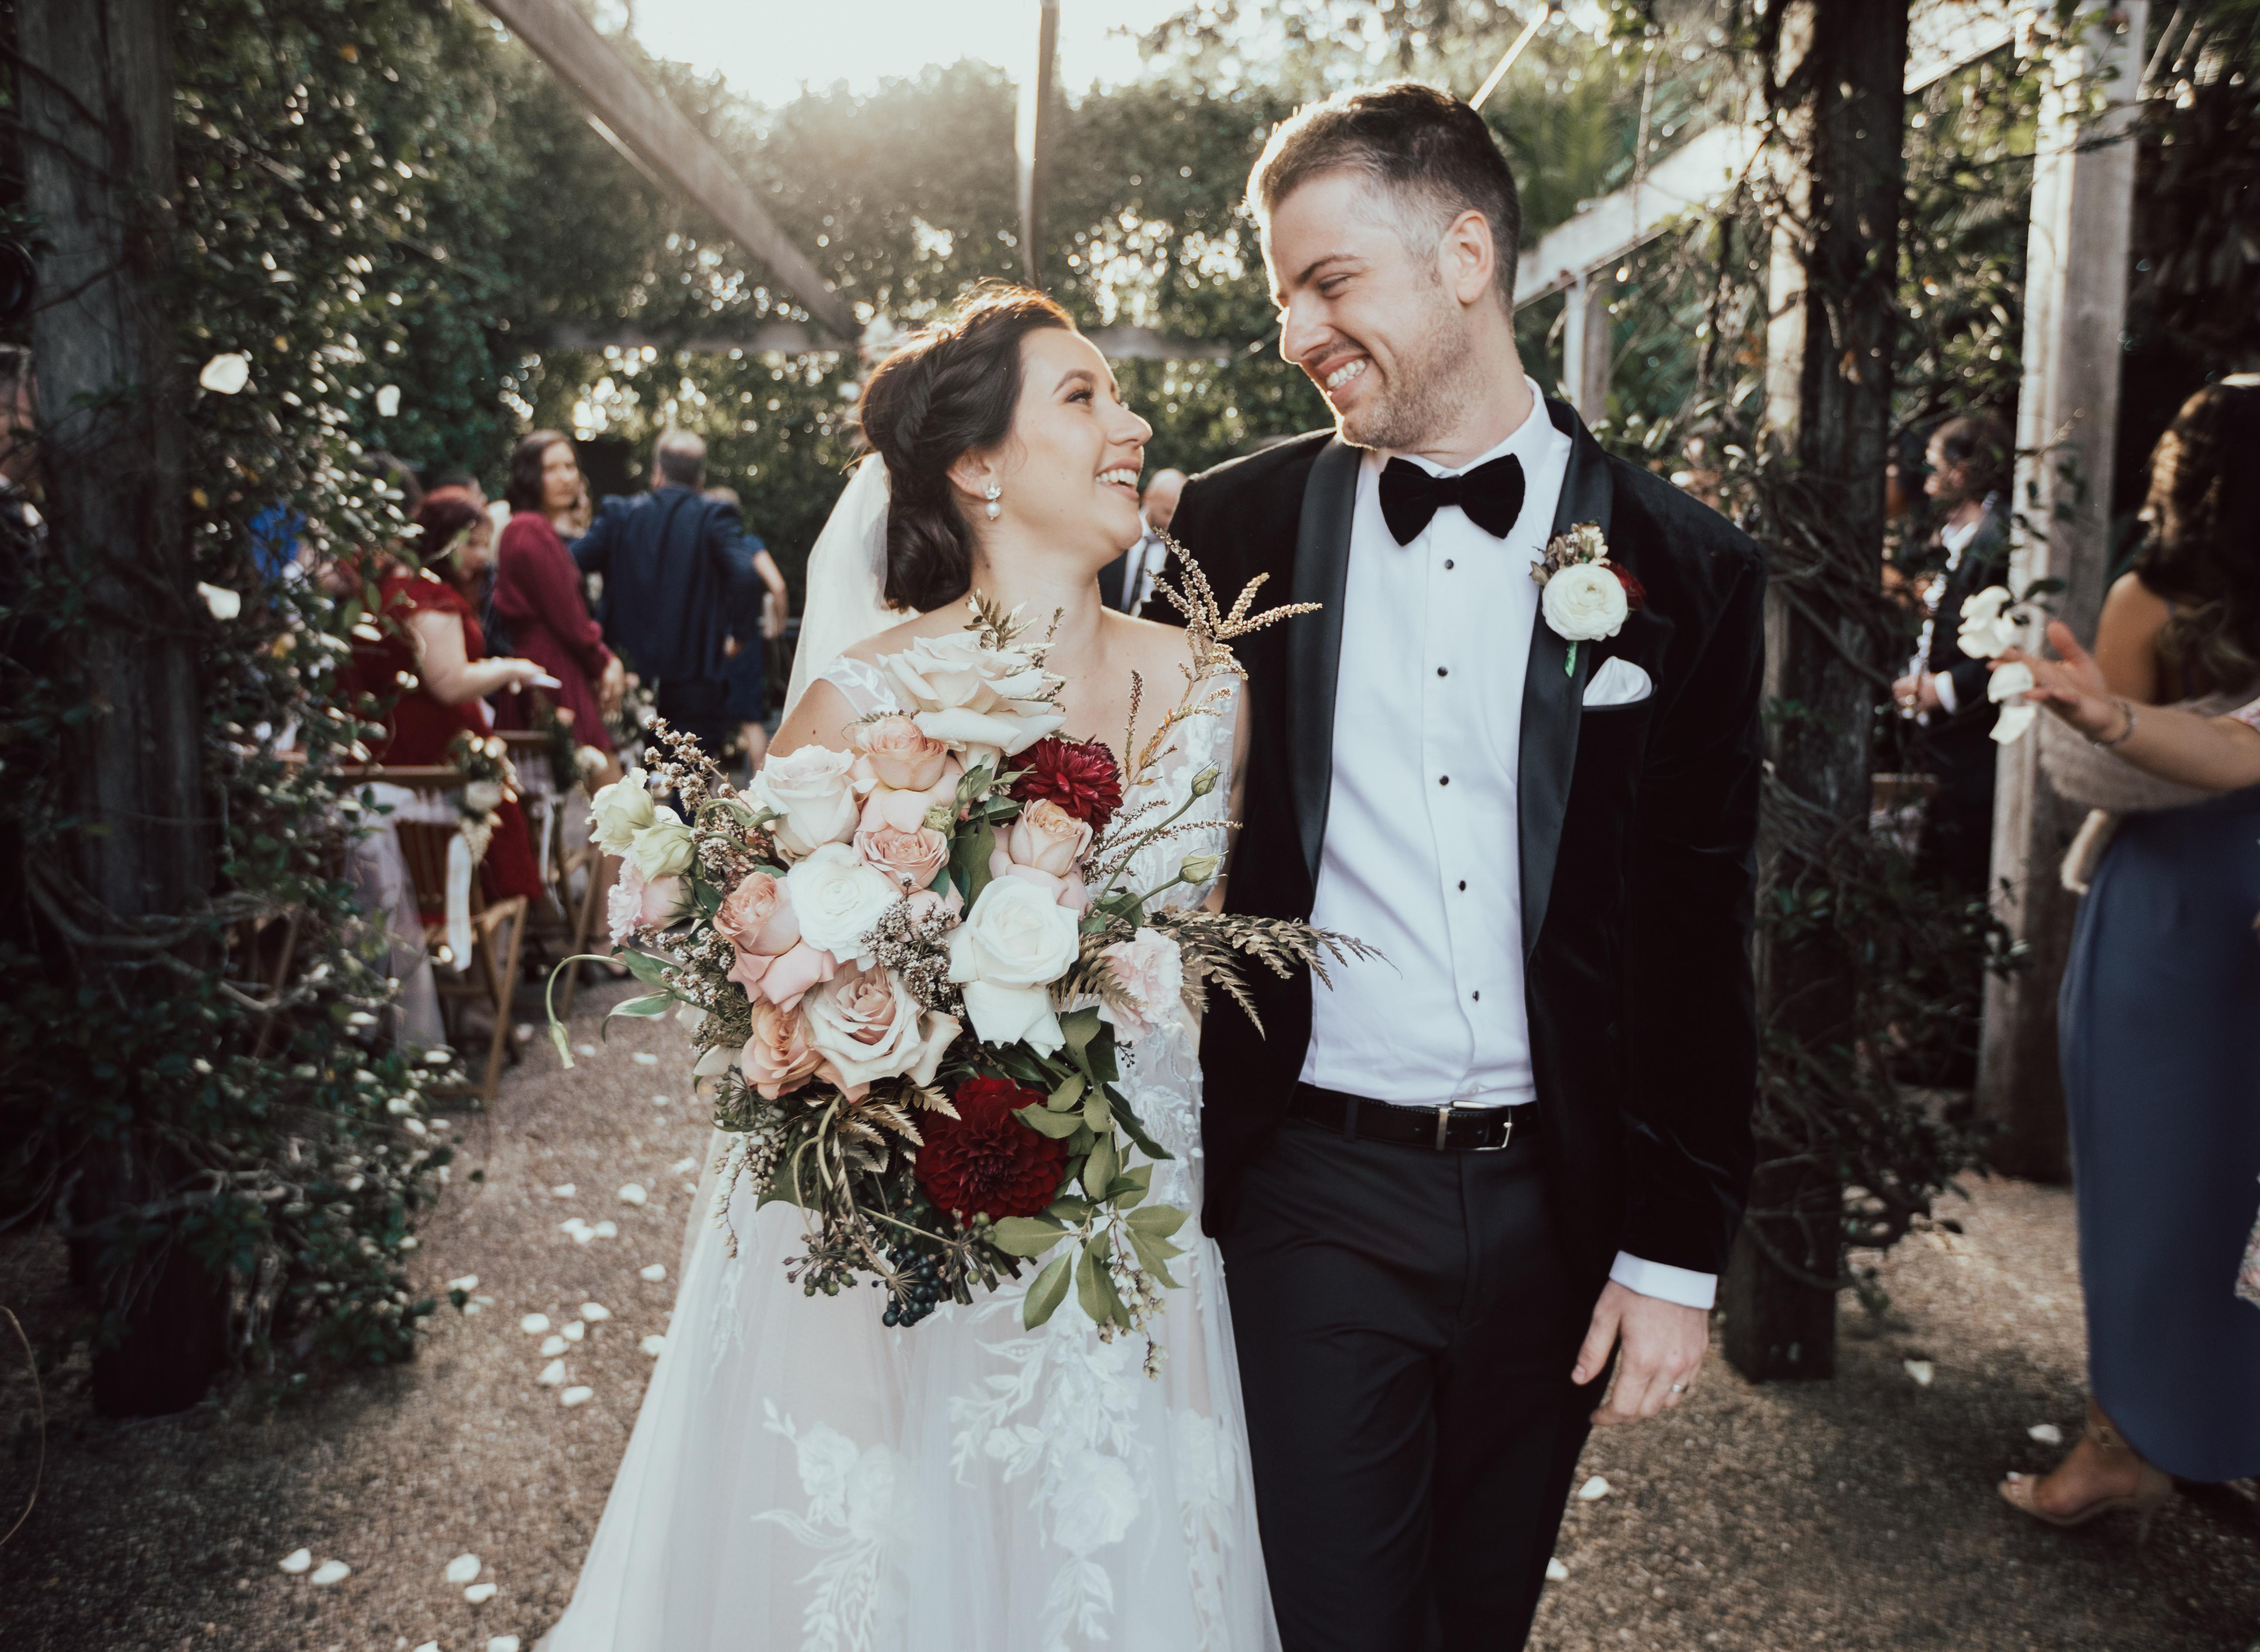 Wedding Videography (Half Day)